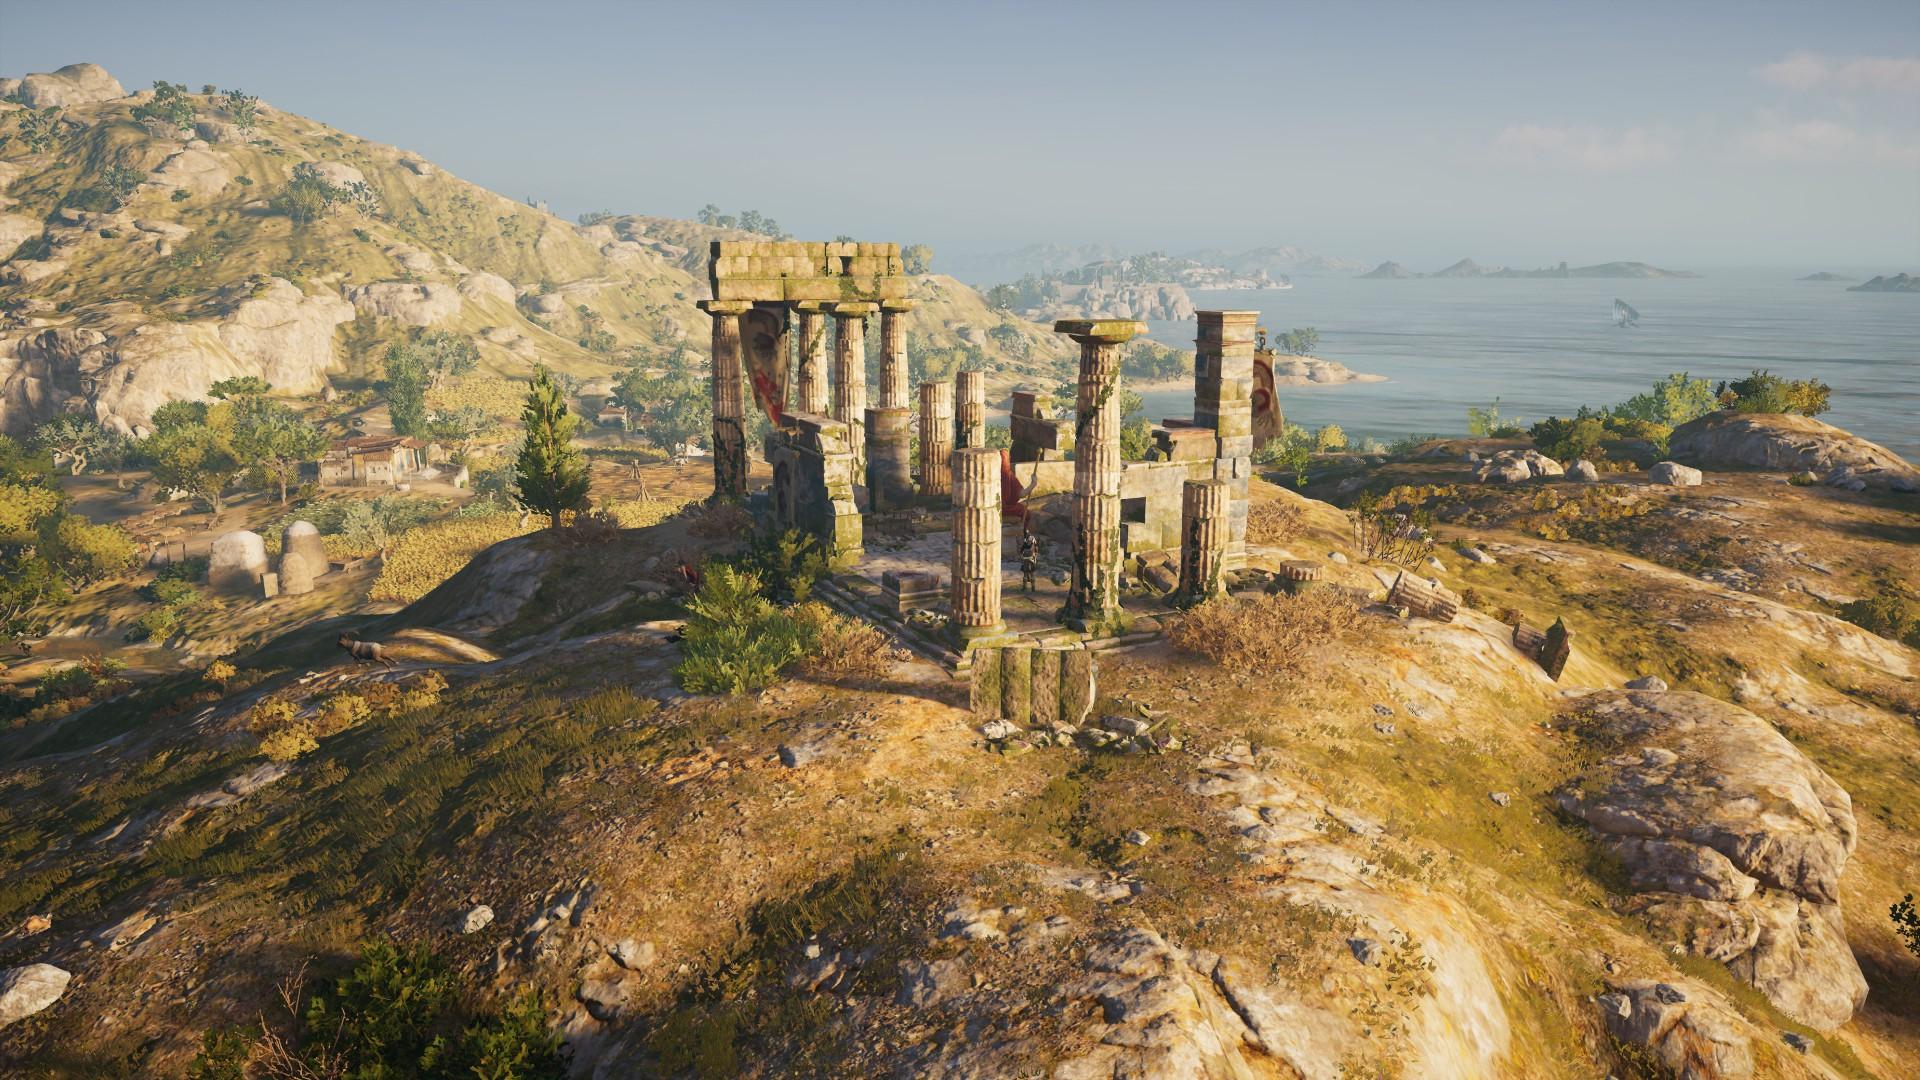 Burned Temple of Hera | Assassin's Creed Wiki | FANDOM